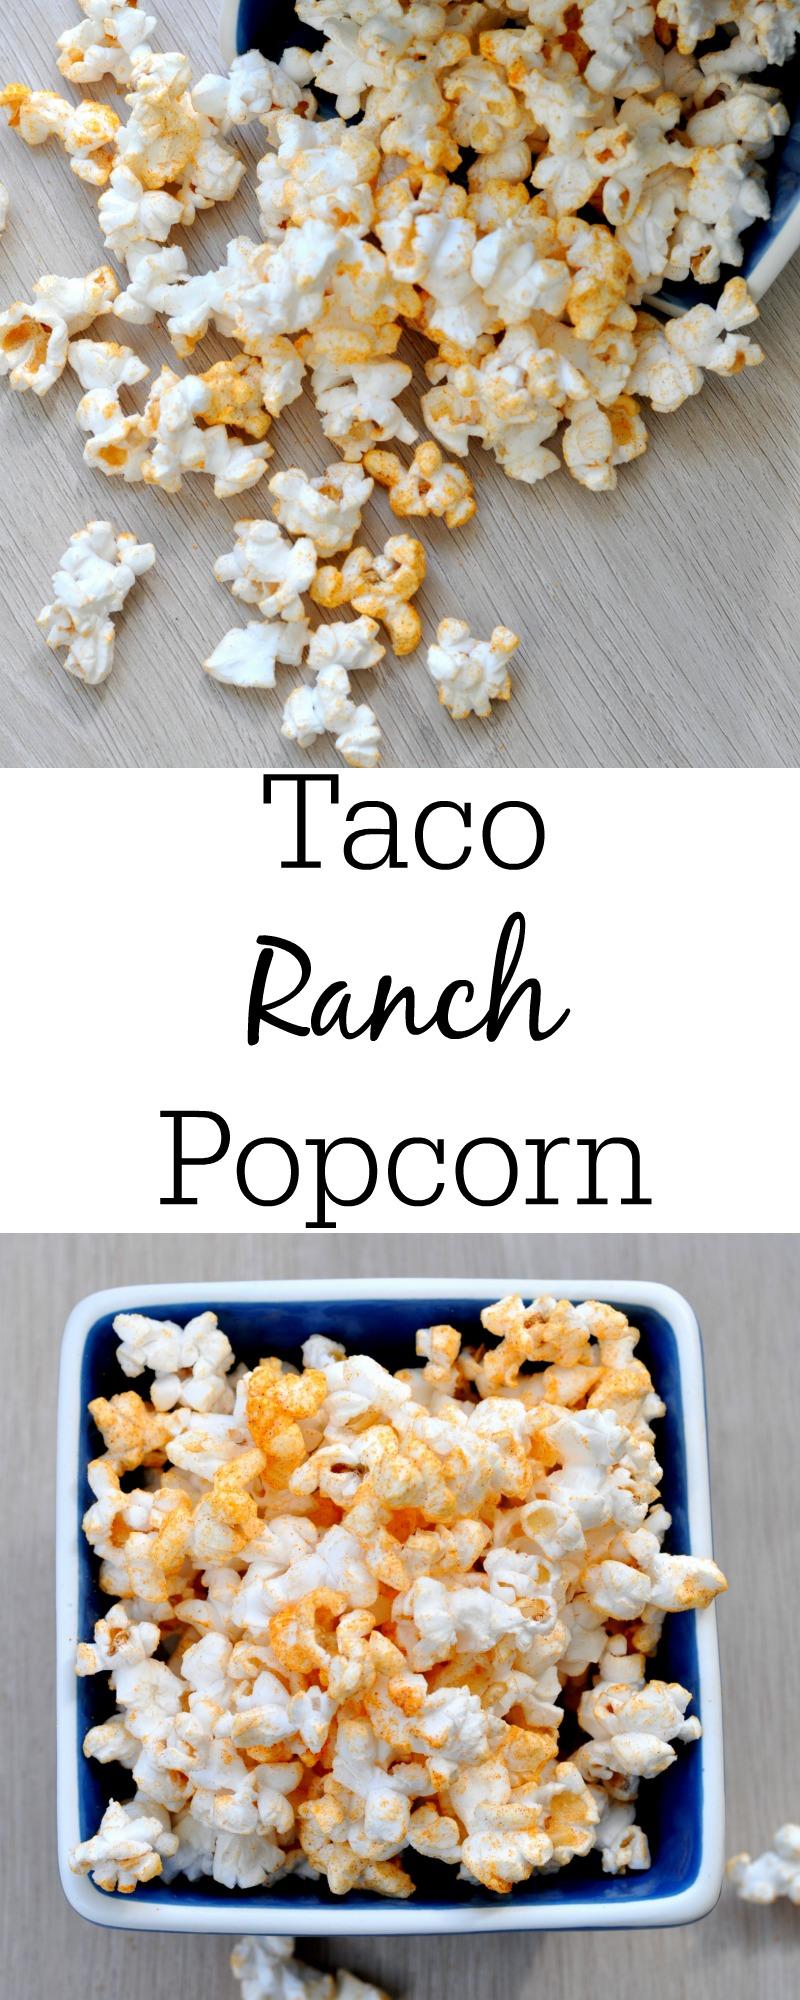 Taco Ranch Popcorn